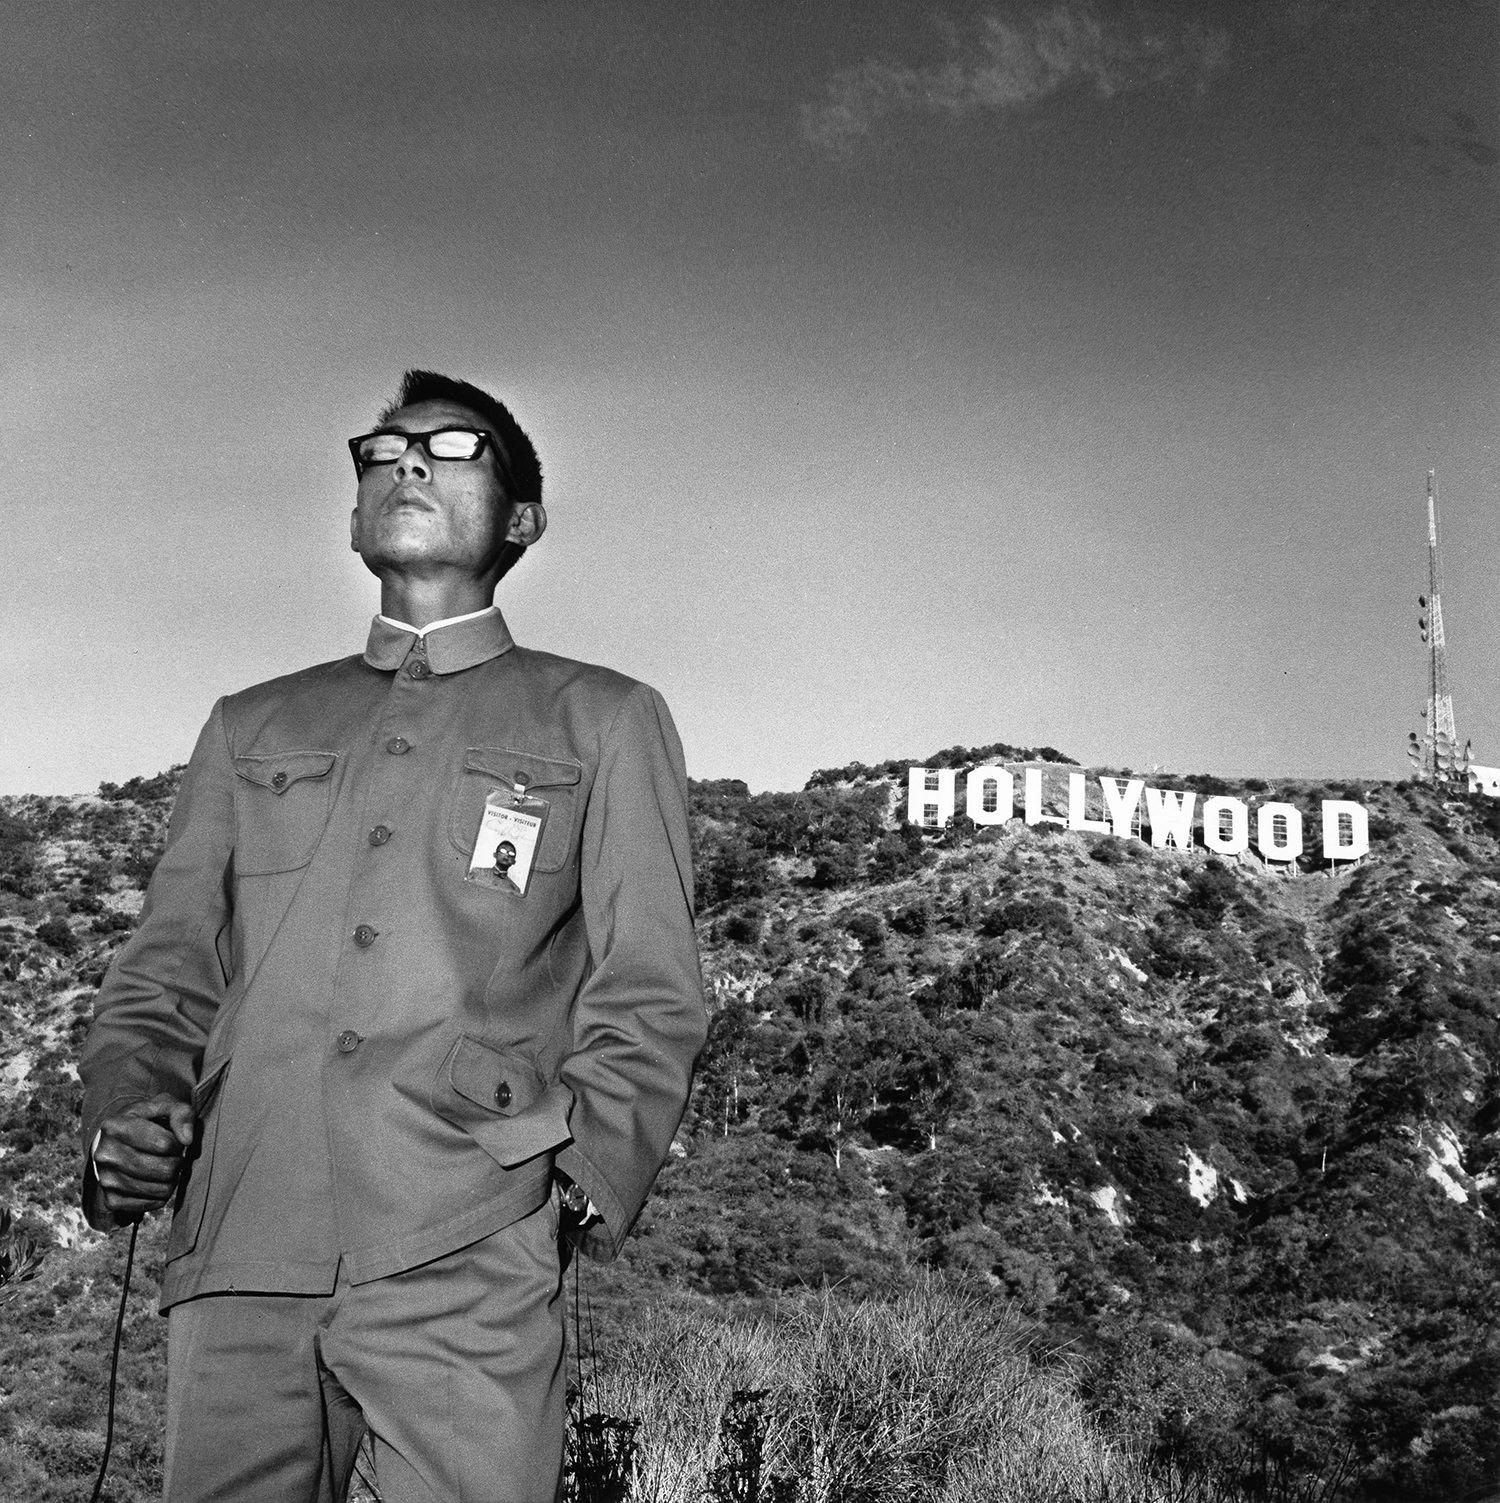 Hollywood, California, 1979